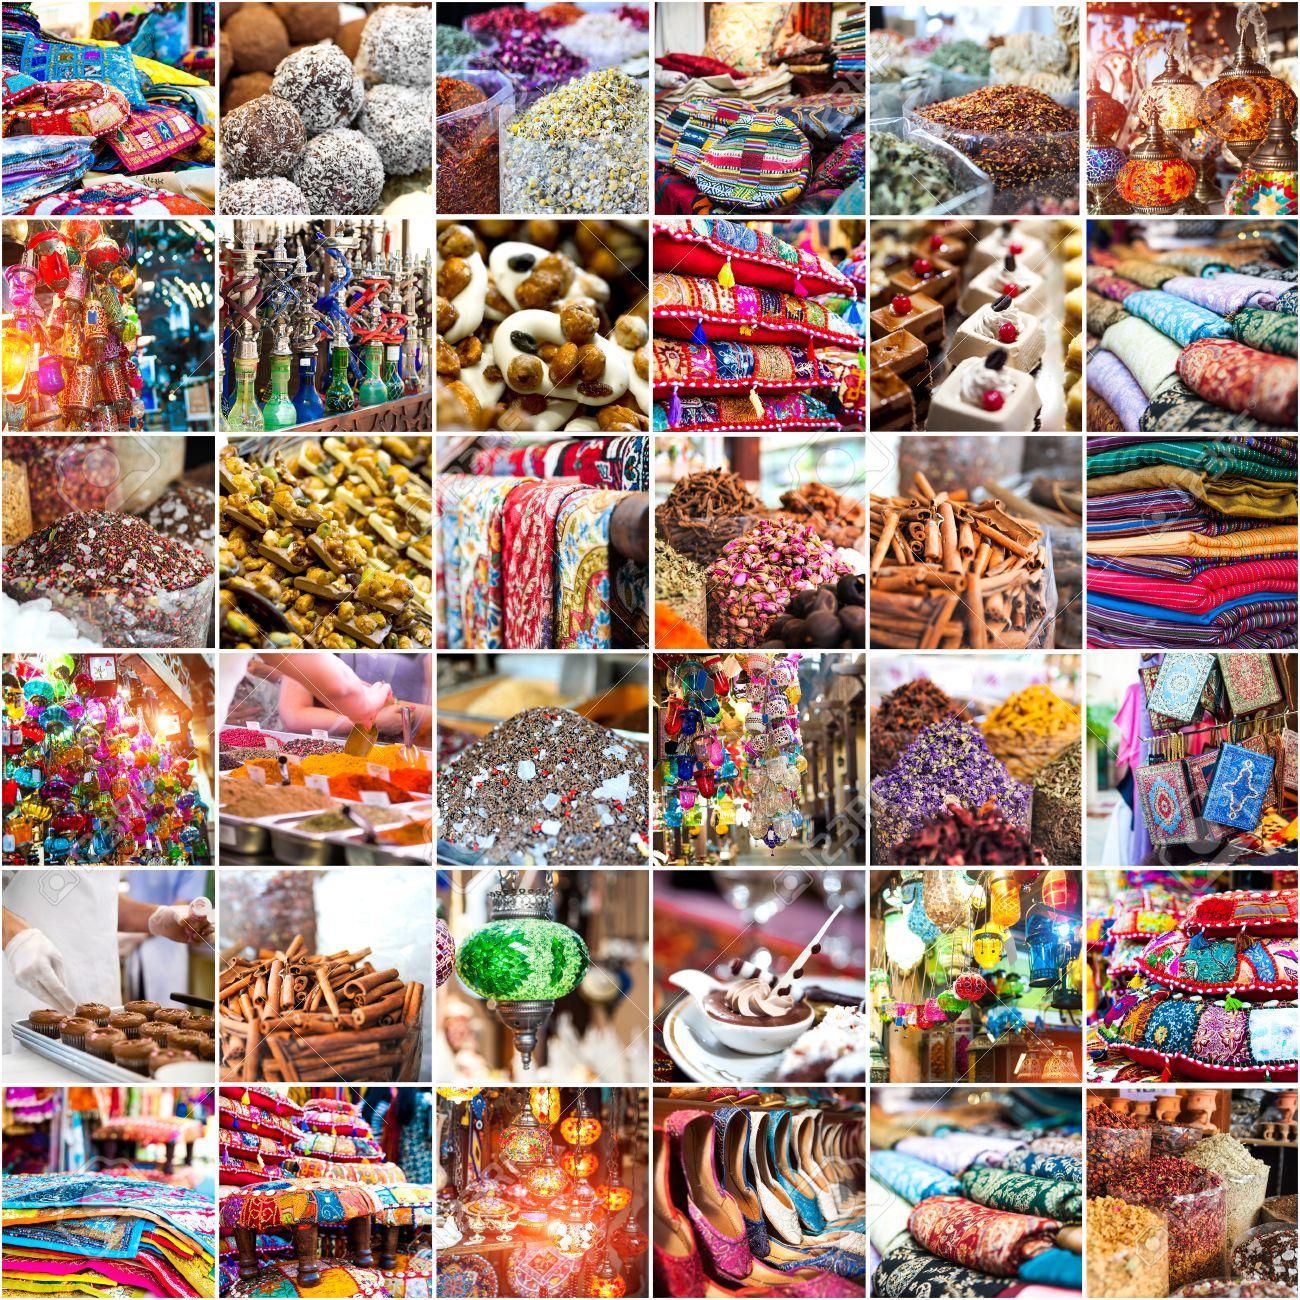 collage photo merchandise in the Arab market - 33880626